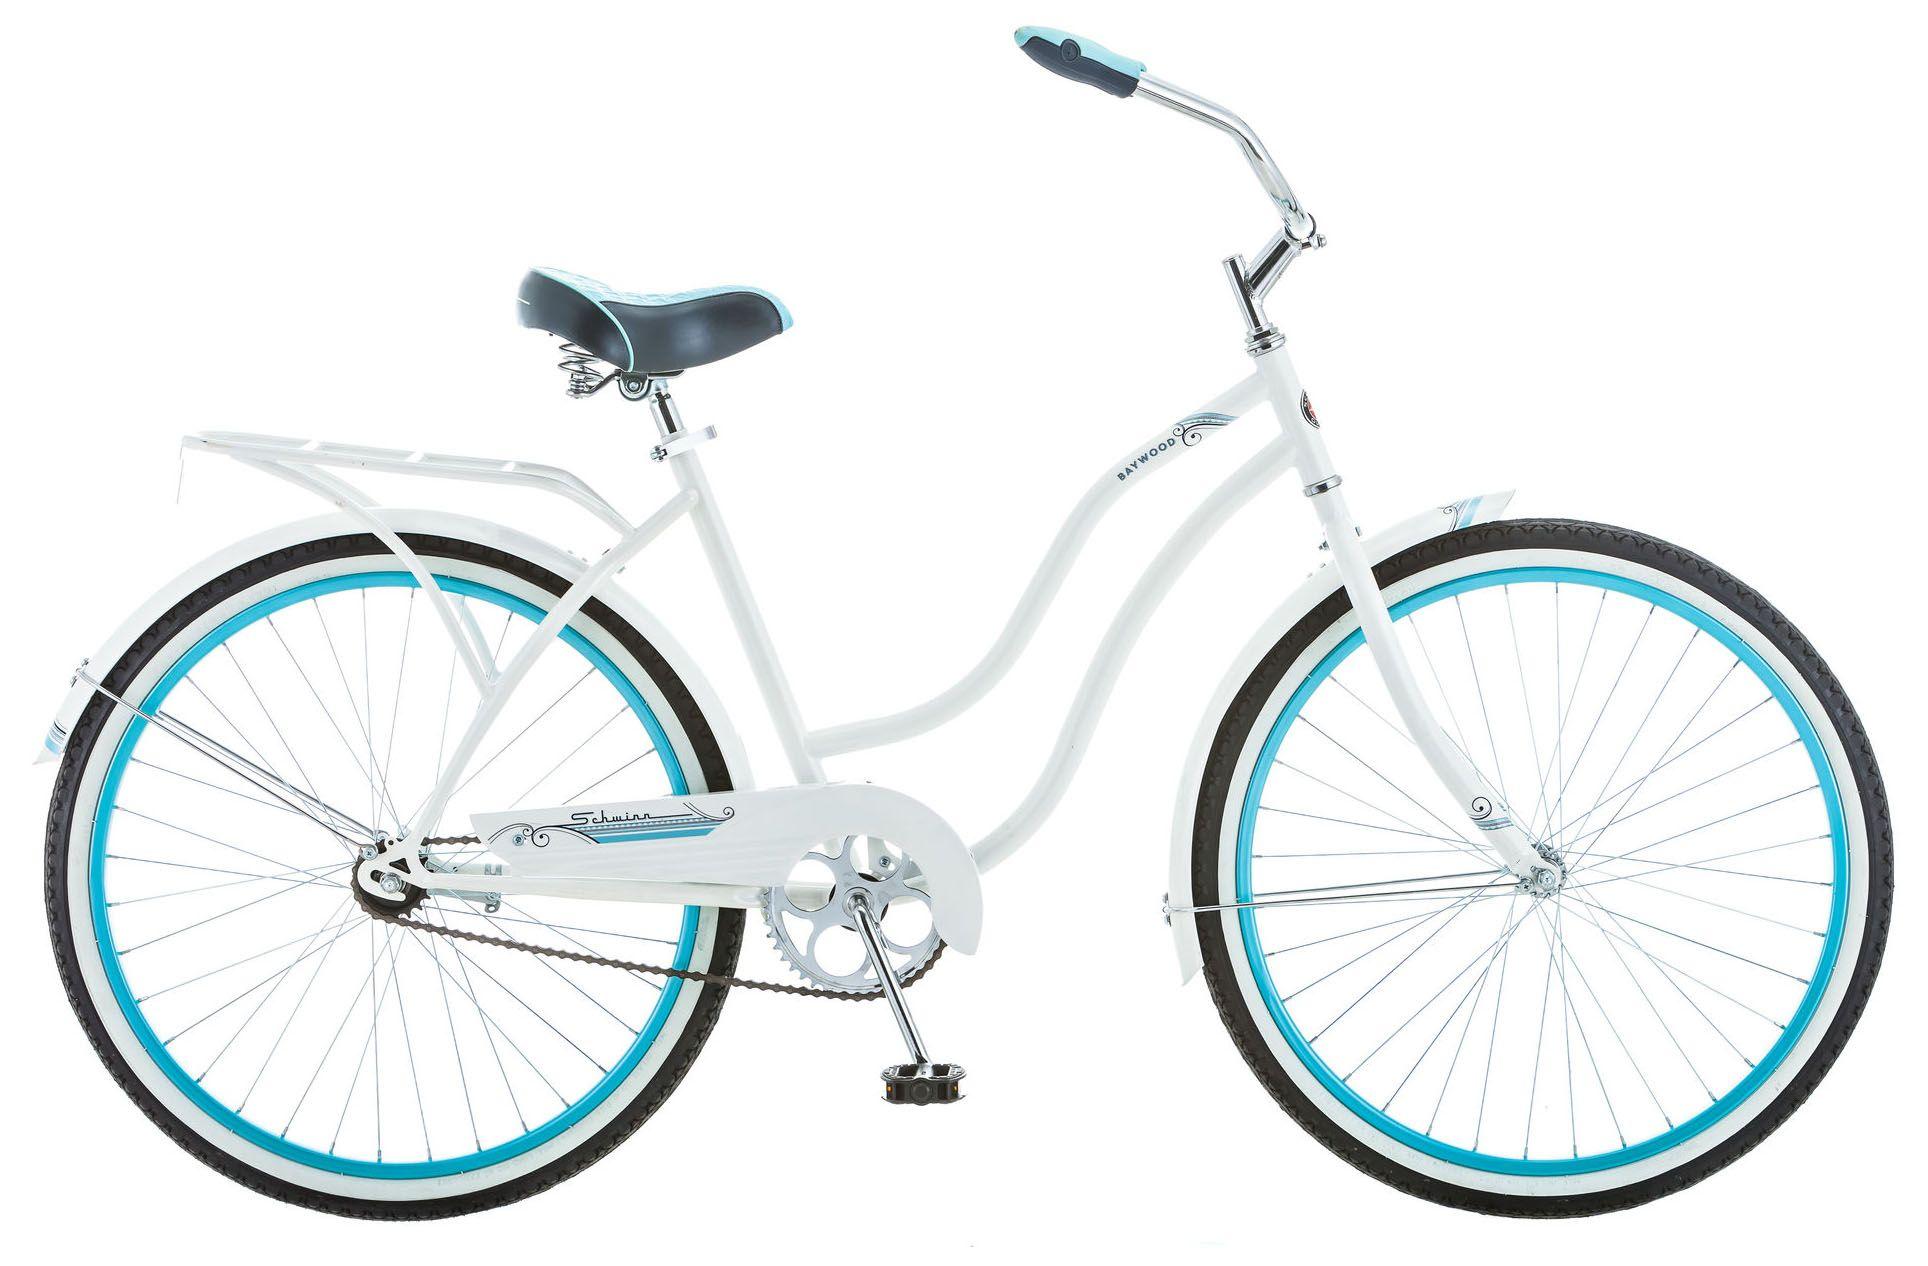 Велосипед Schwinn Baywood 26 2018 велосипед schwinn lil stardust 16 2018